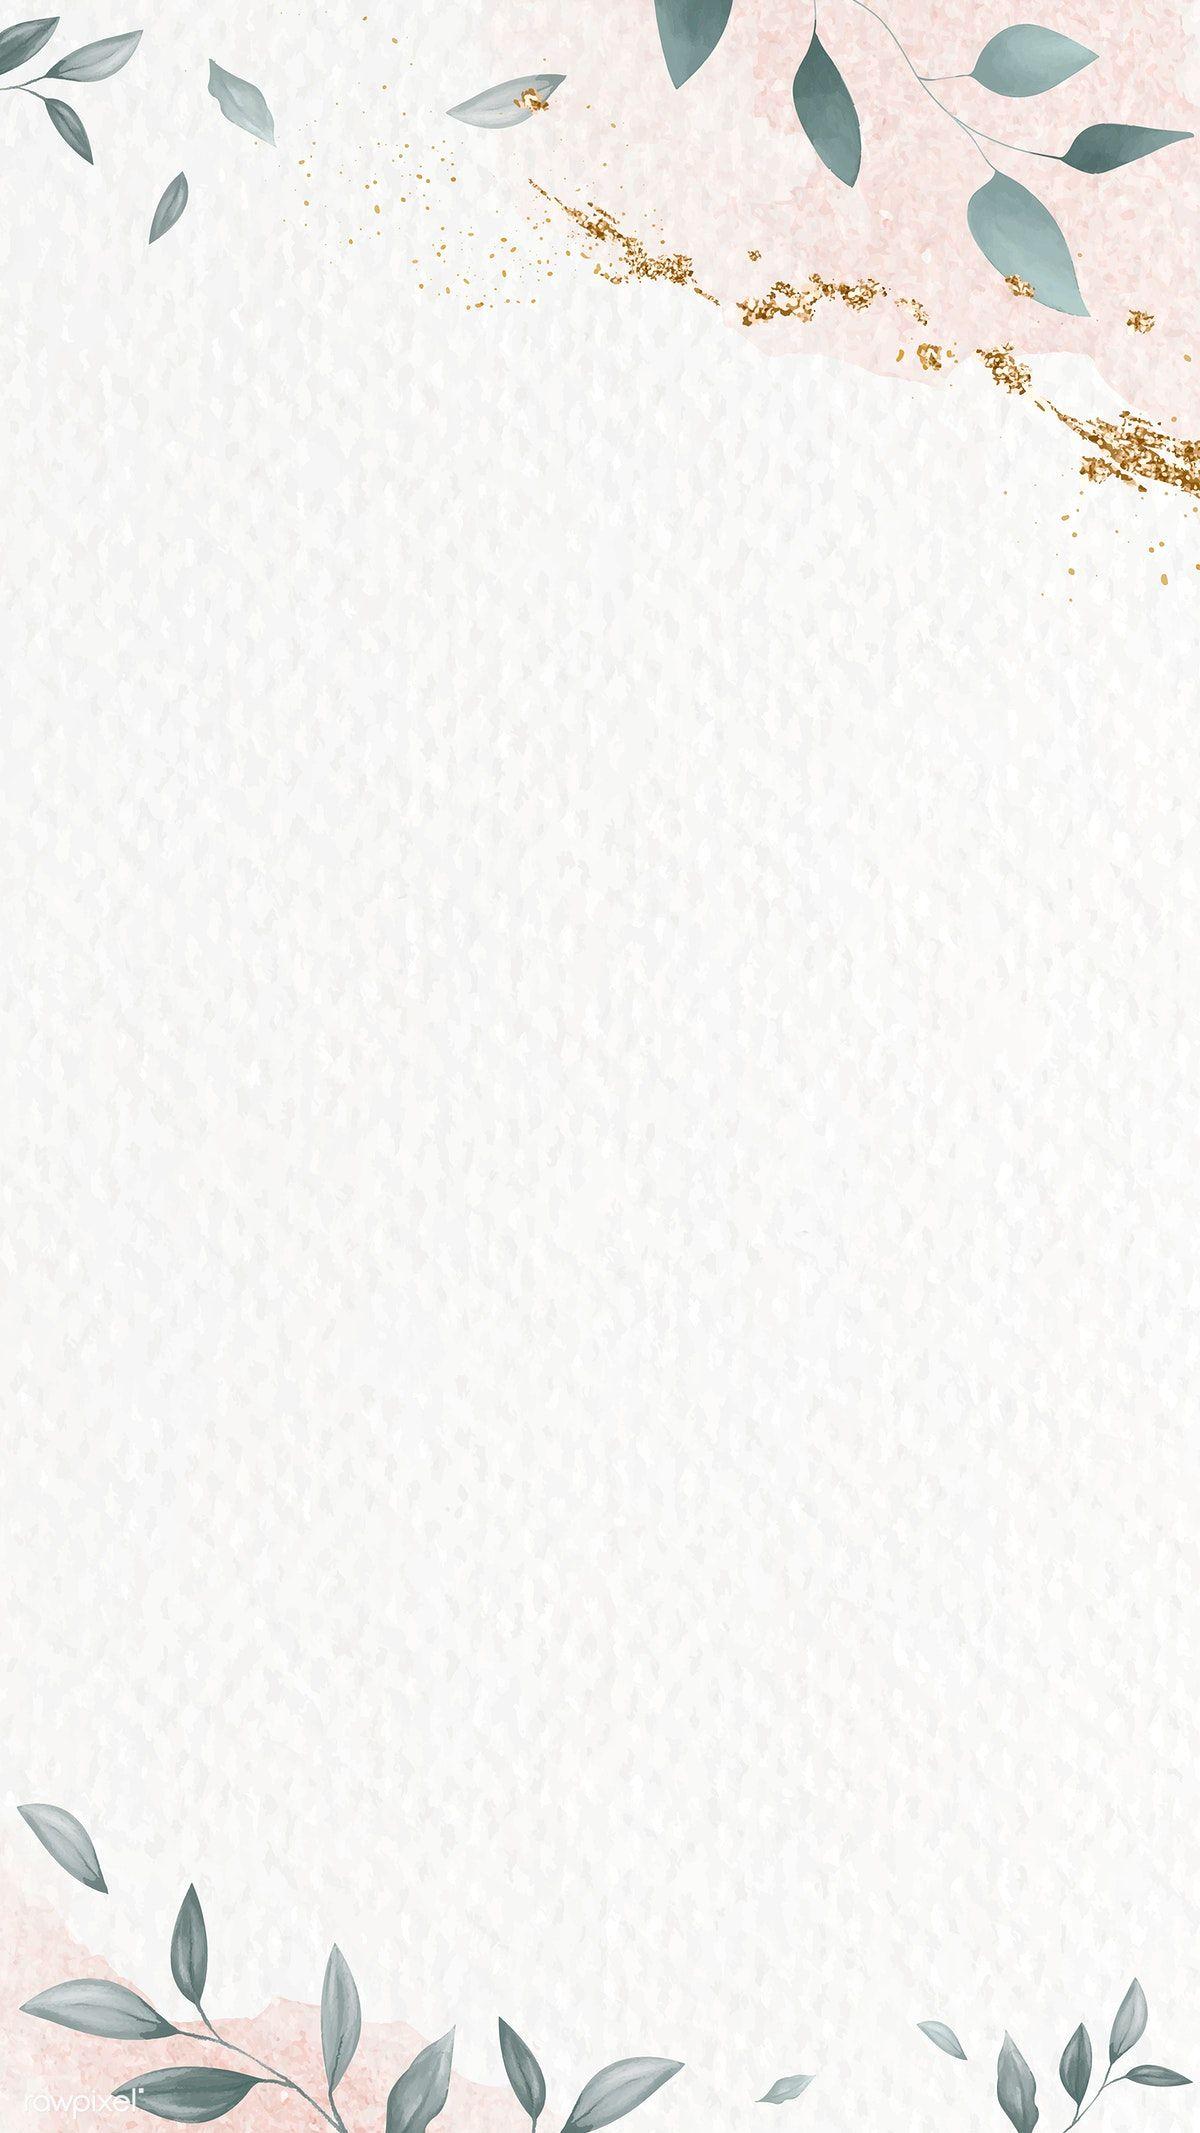 Download premium vector of Glitter pink leafy frame mobile wallpaper